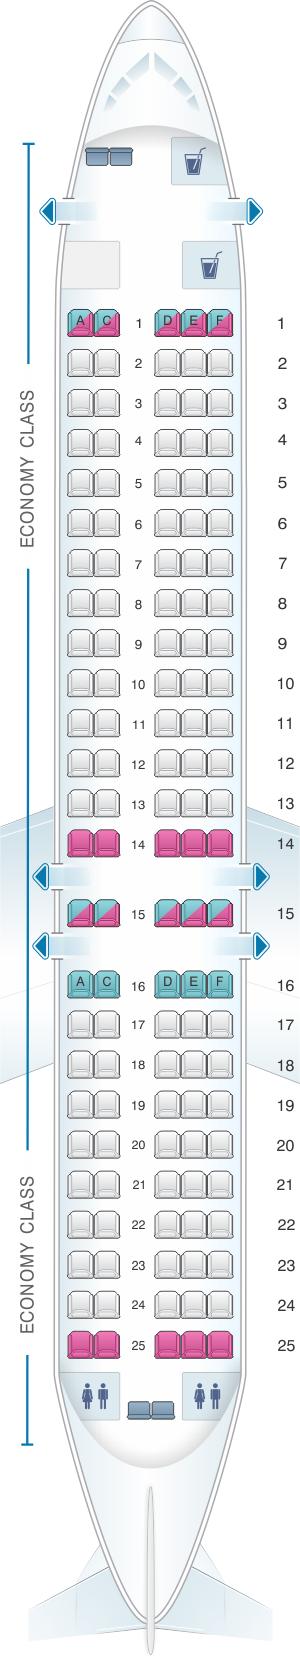 Seat map for QantasLink Boeing B717 200 125PAX